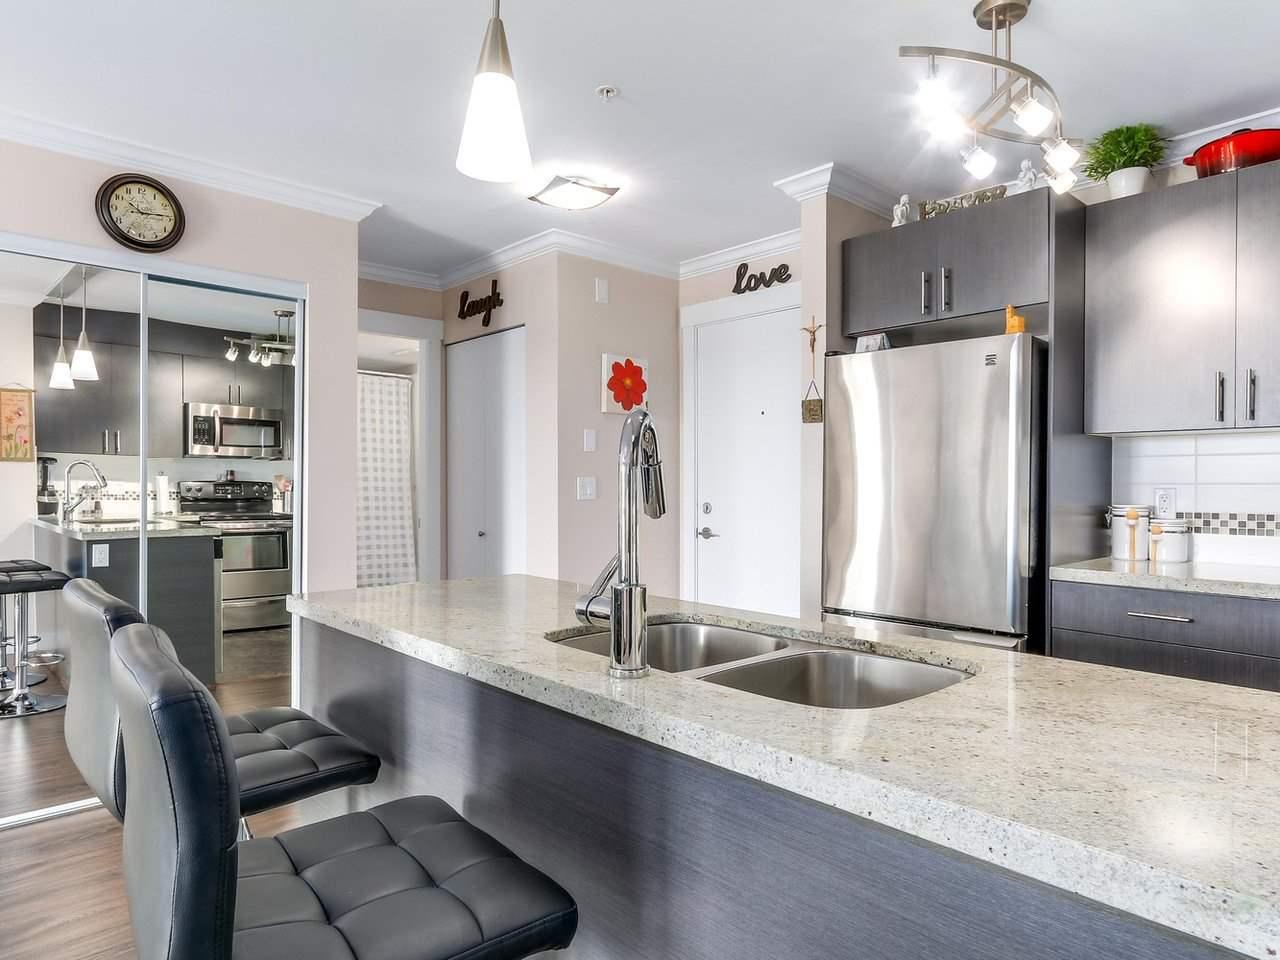 Condo Apartment at 206 7738 EDMONDS STREET, Unit 206, Burnaby East, British Columbia. Image 12